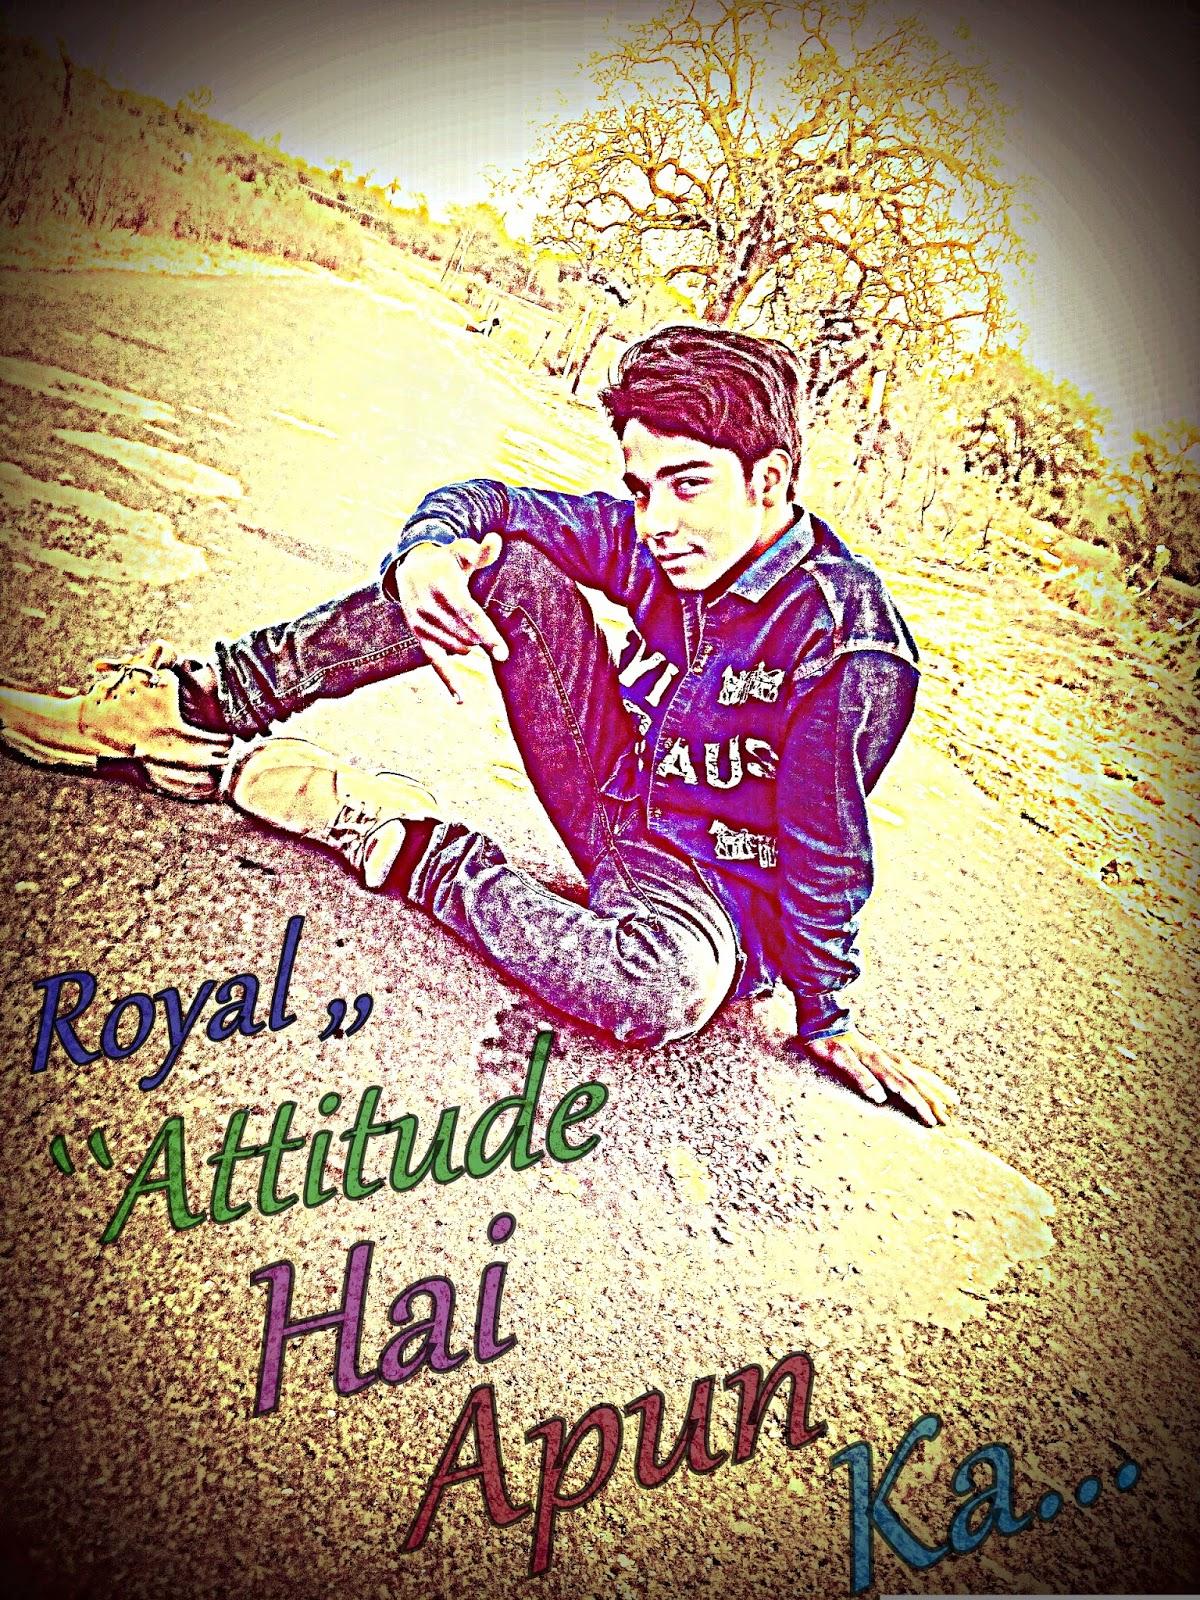 Royal DJ Sound Aron